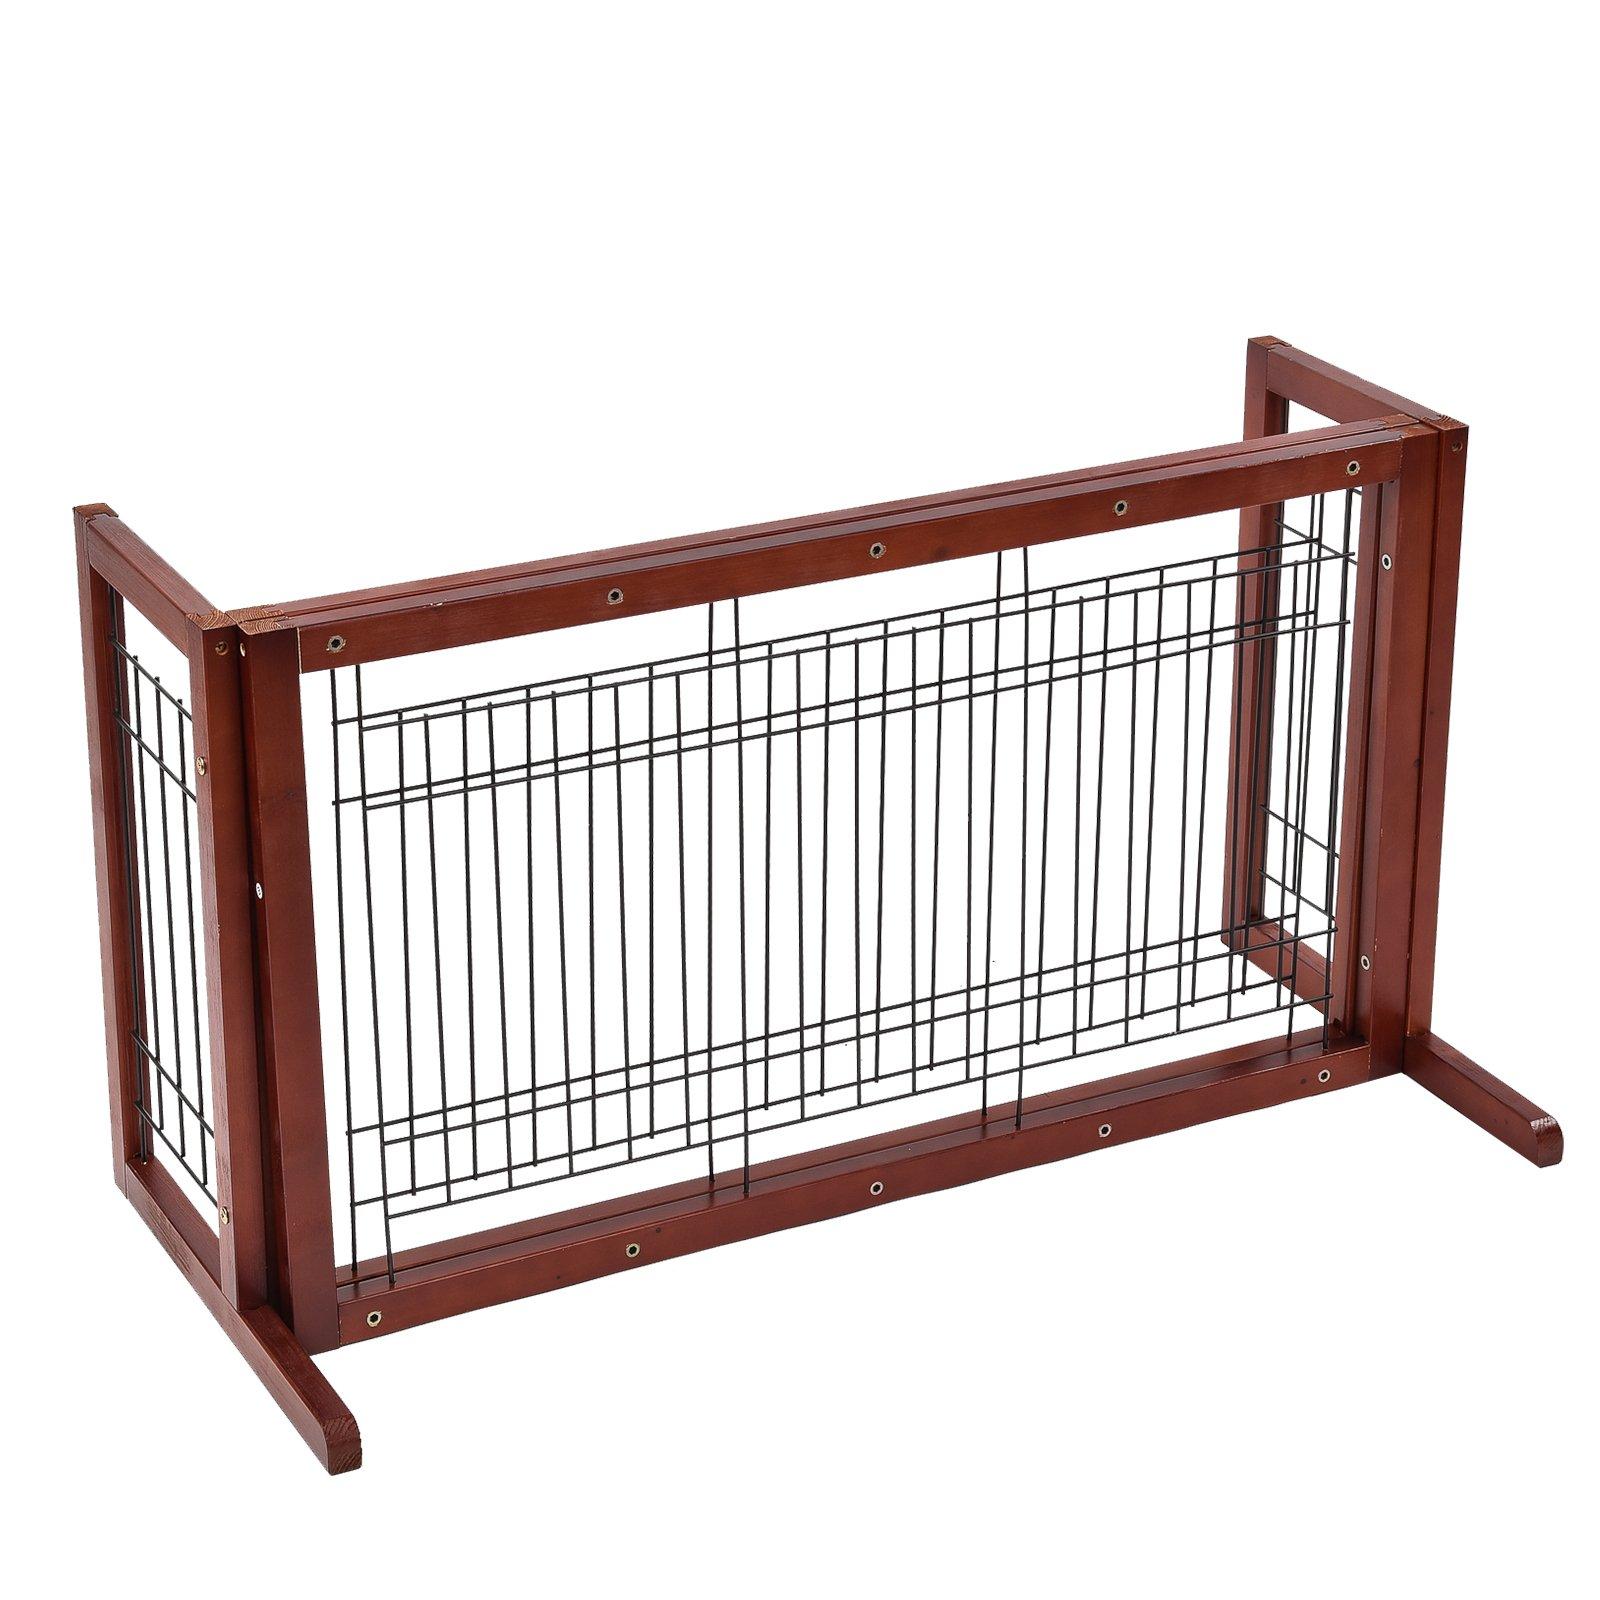 SUNCOO Adjustable Freestanding Dog Gate Solid Construction Indoor Pet Fence Dark Brown